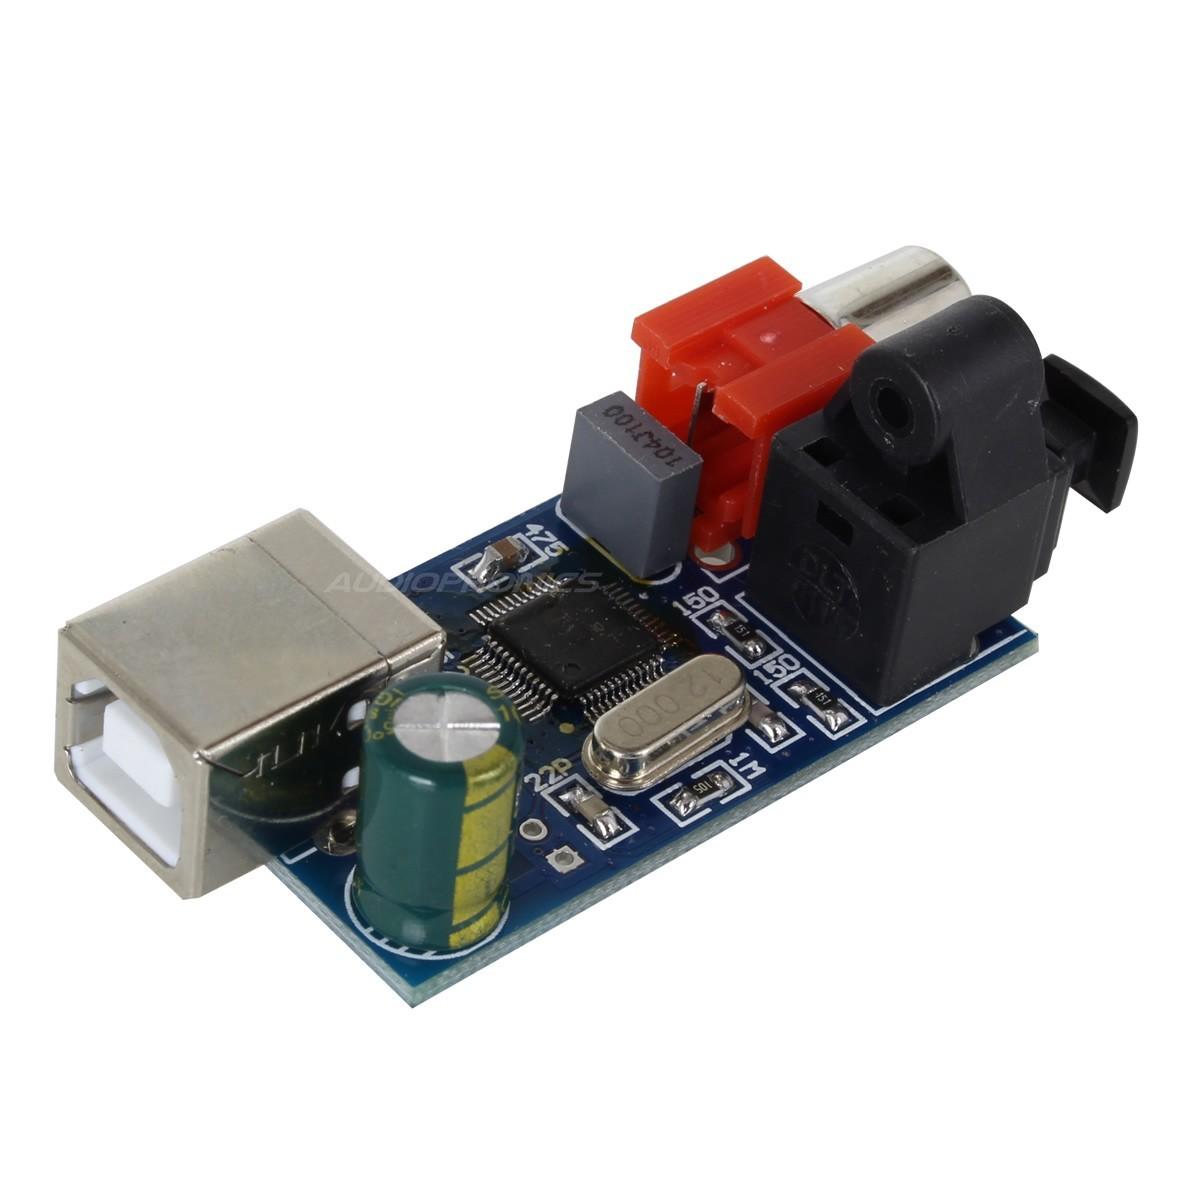 Interface Digitale CM-108 USB vers SPDIF / I2S DTS